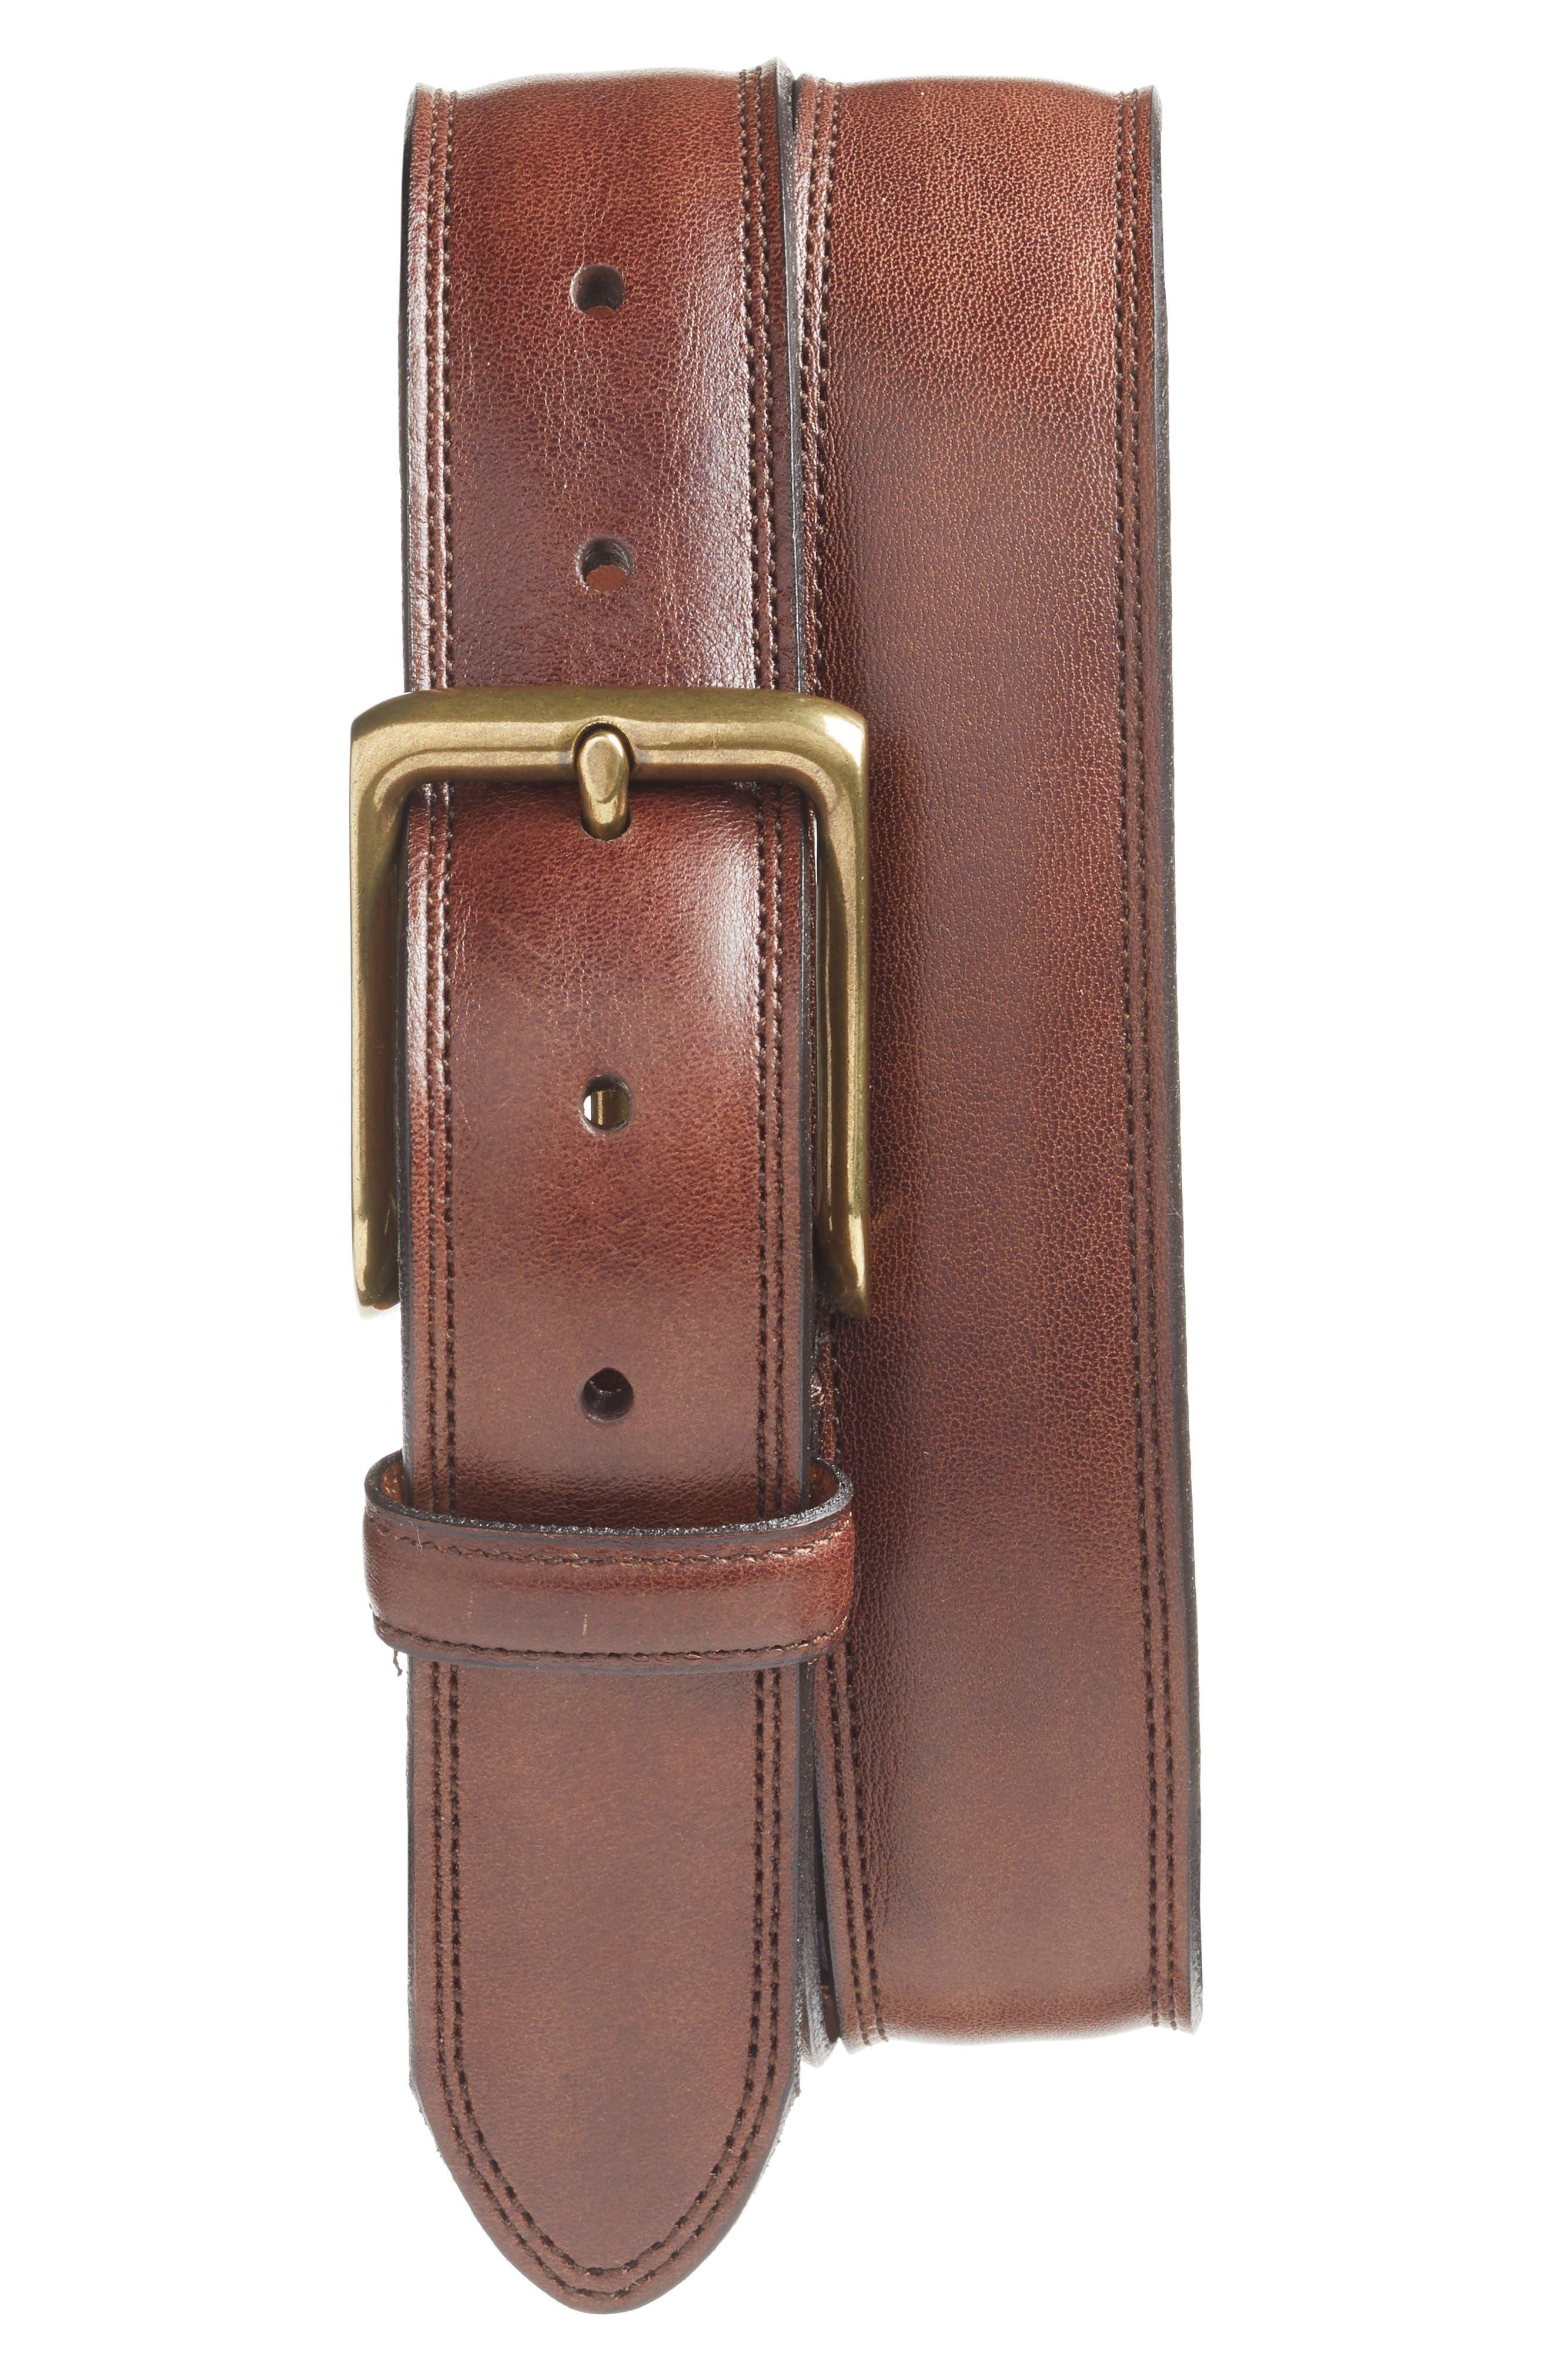 Bosca The Jefferson Leather Belt, Dark Brown